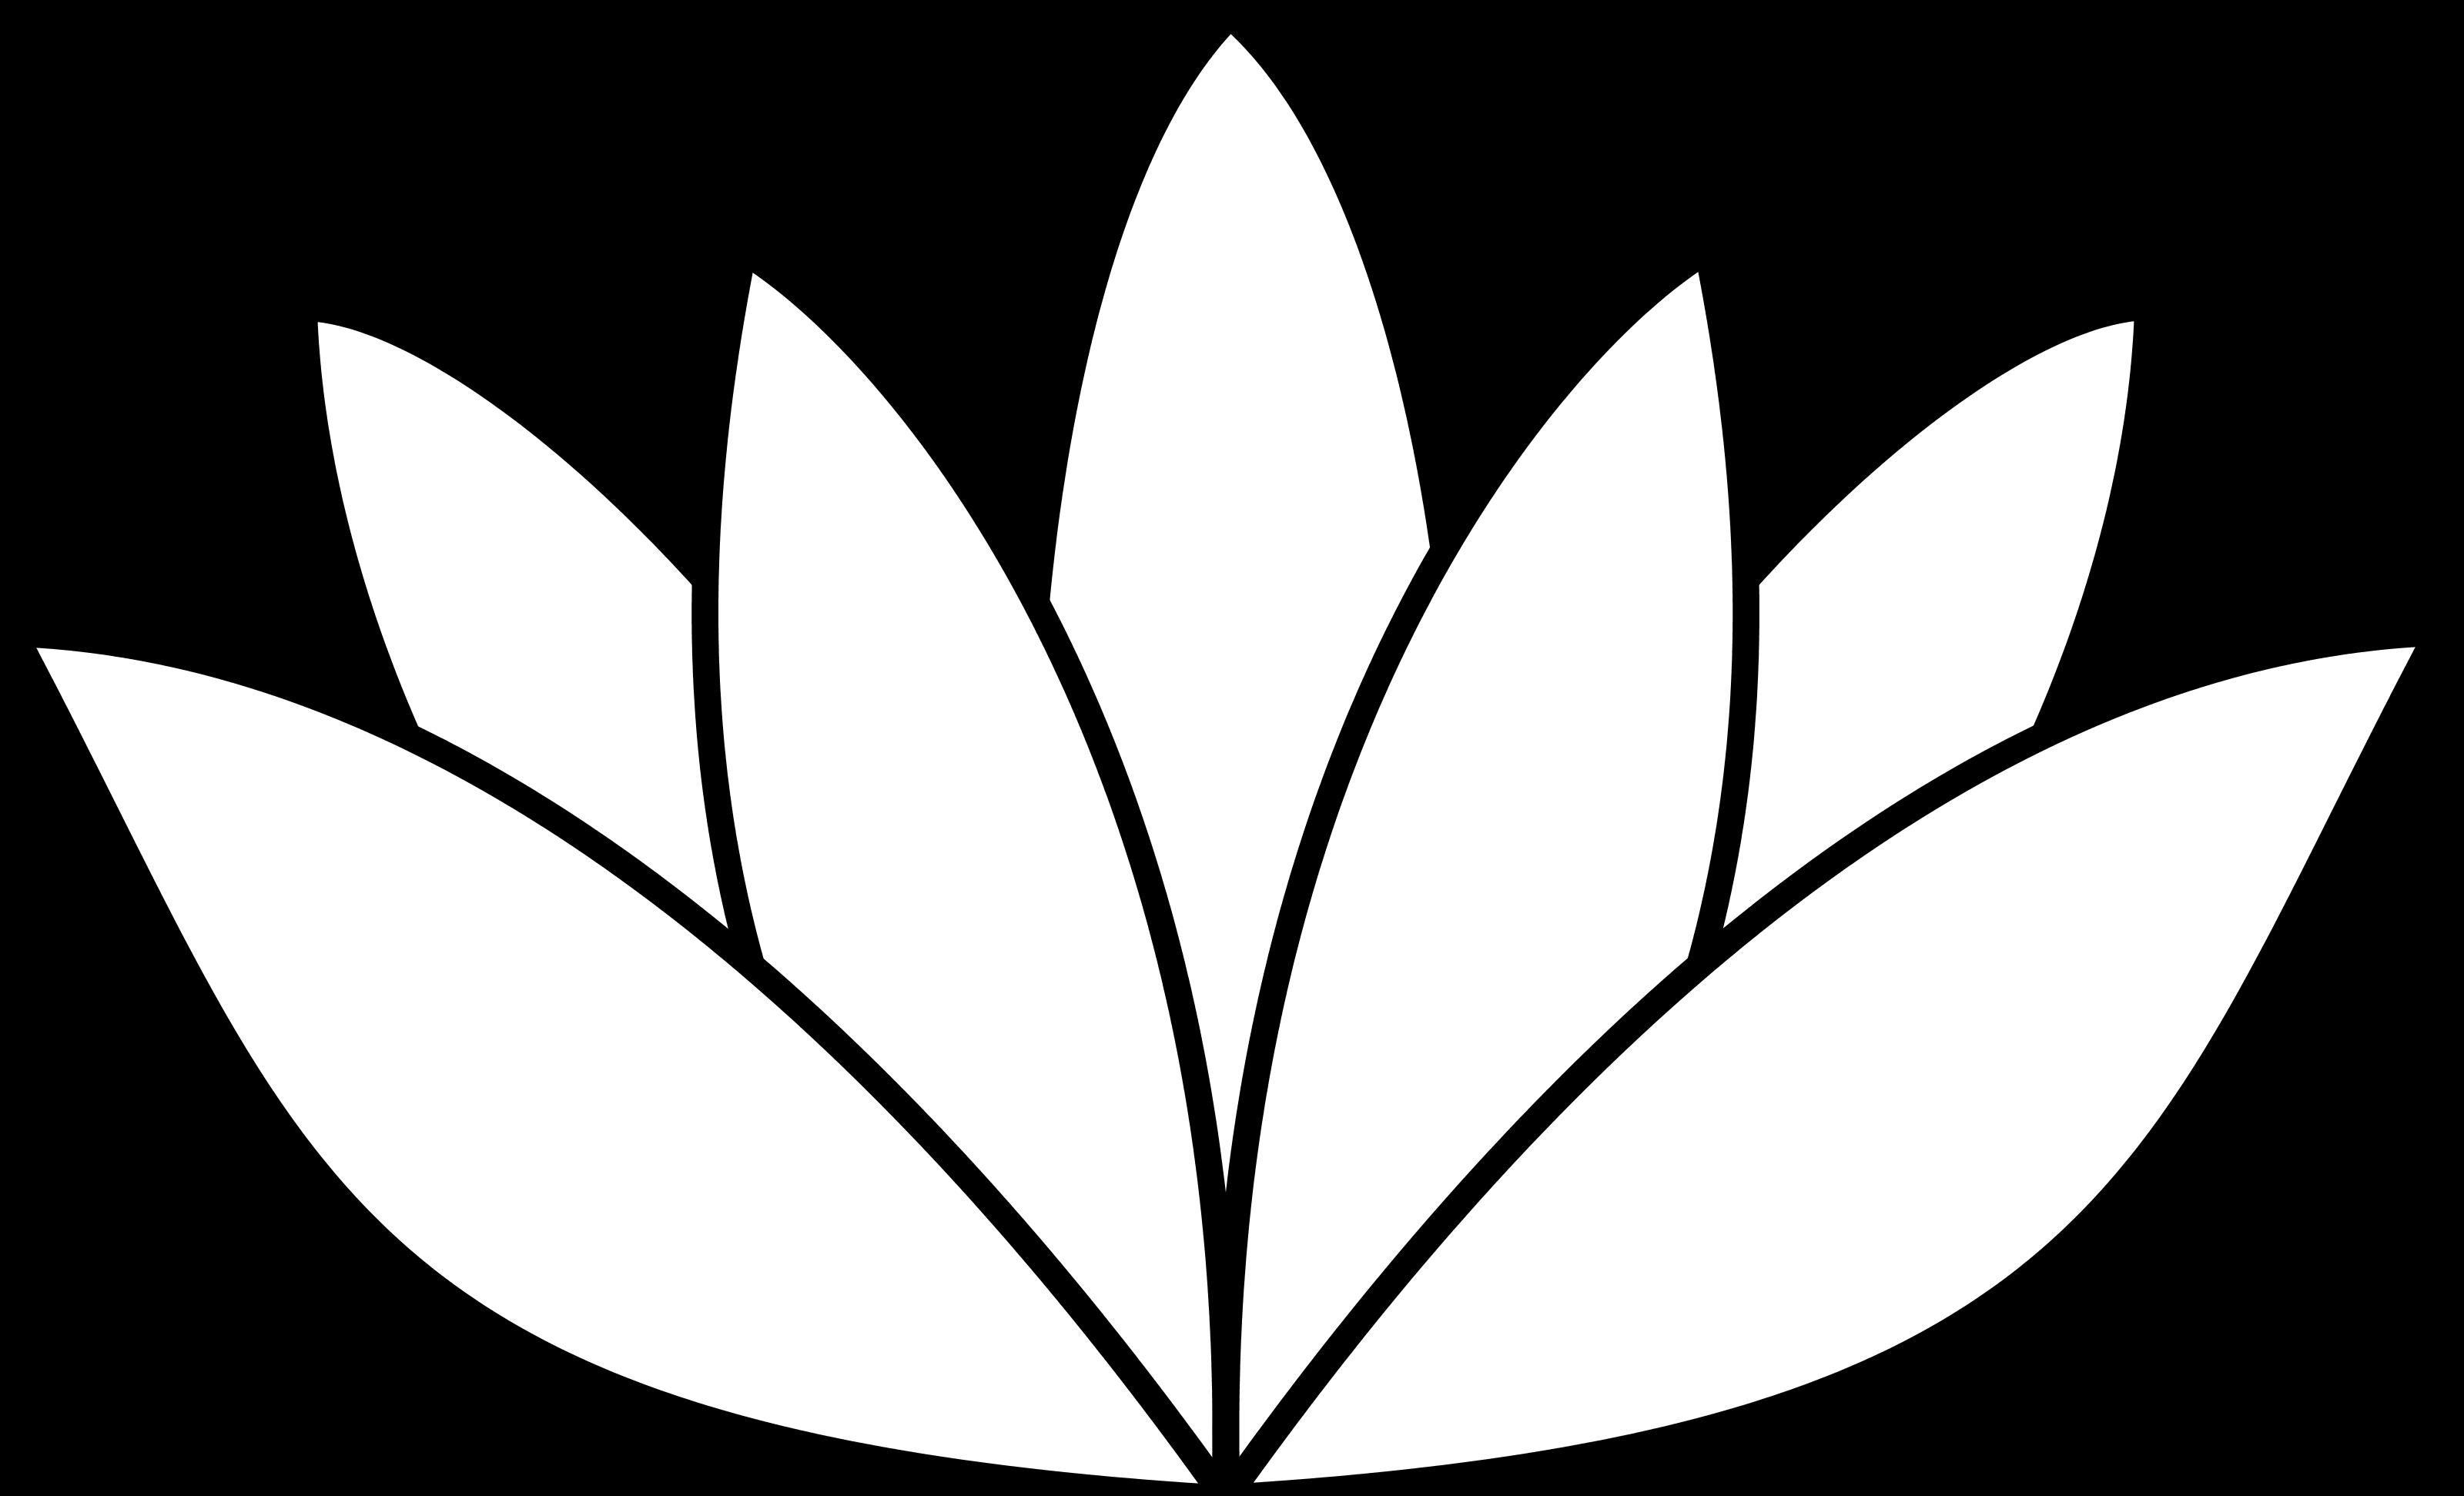 Line Art Lotus Flower : Lotus line drawing clipart best